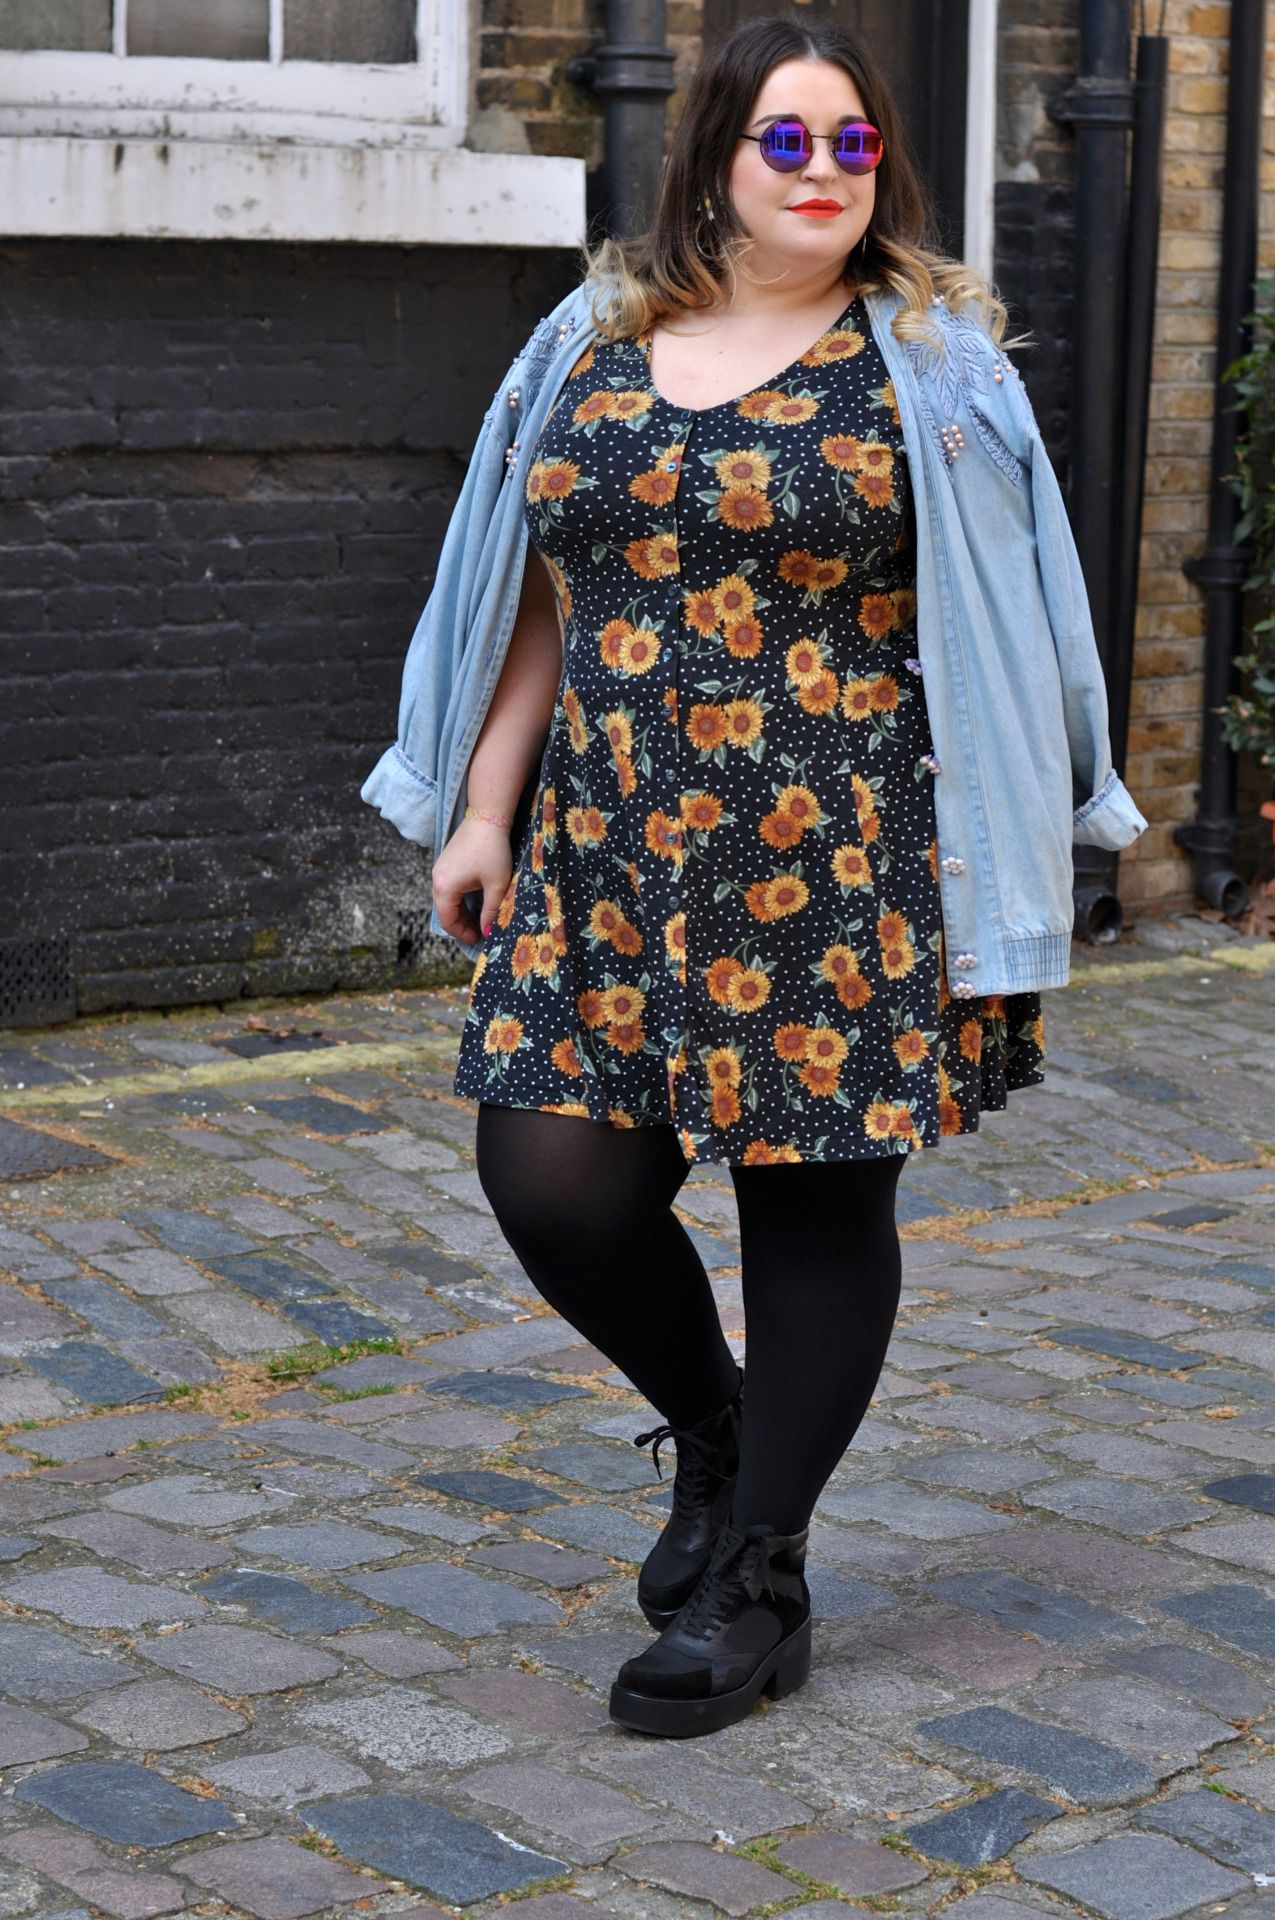 DANIELLE VANIER: 90s Vibes Full Outfit Details...